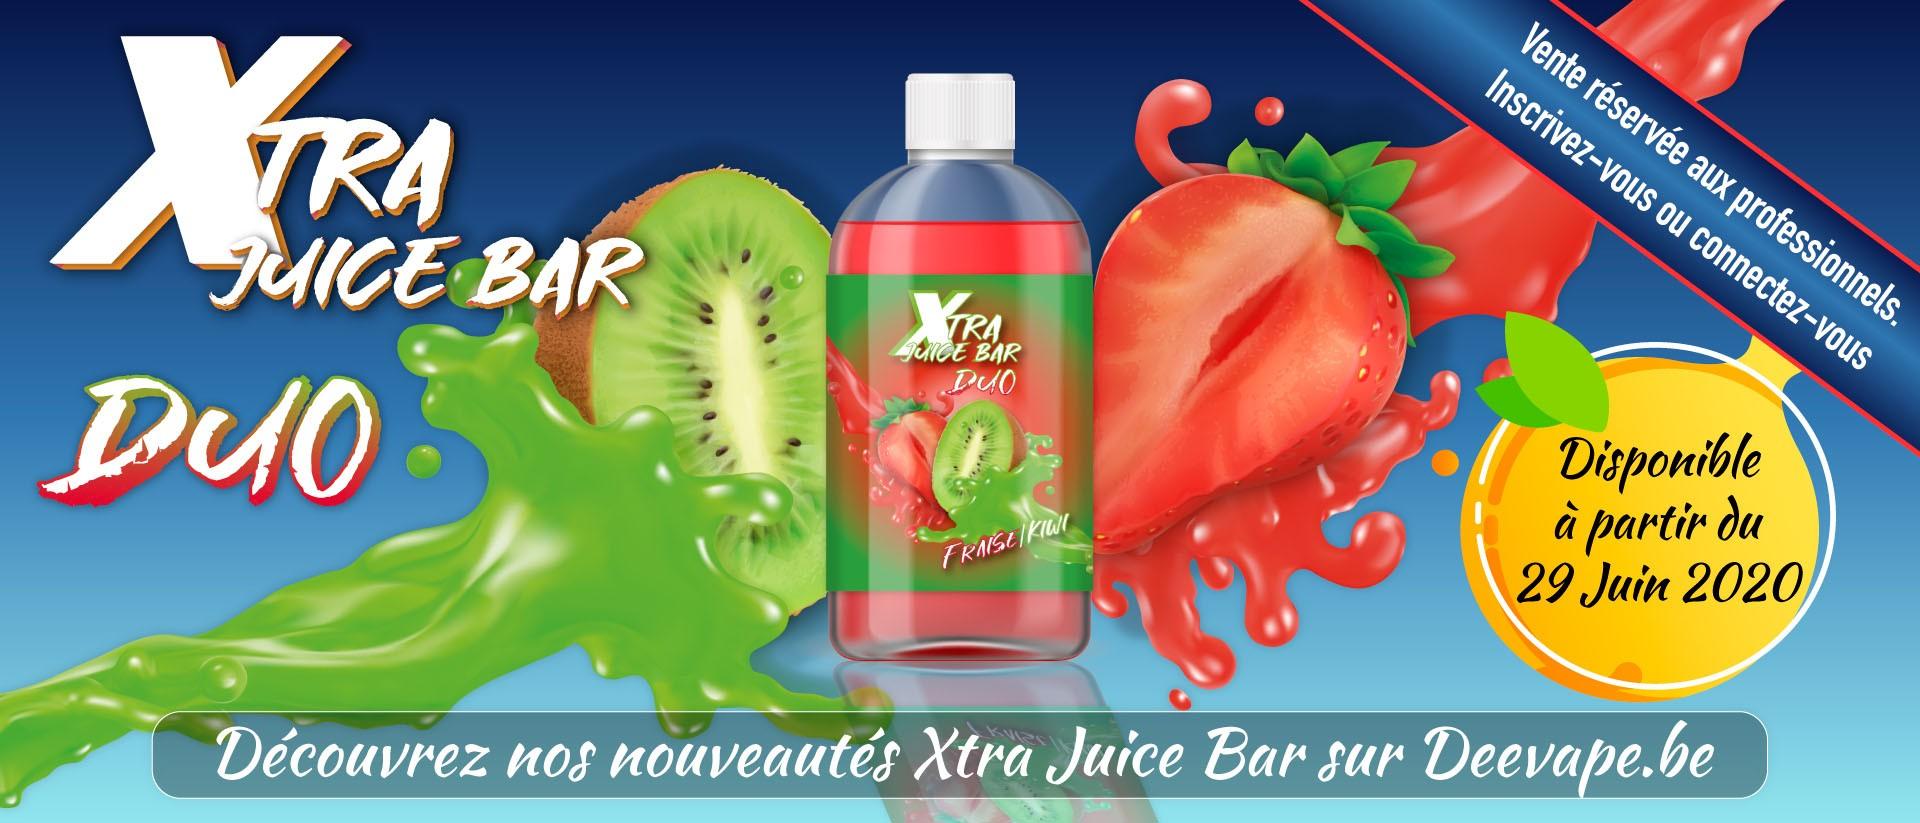 NEW XTRA JUICE BAR DUO